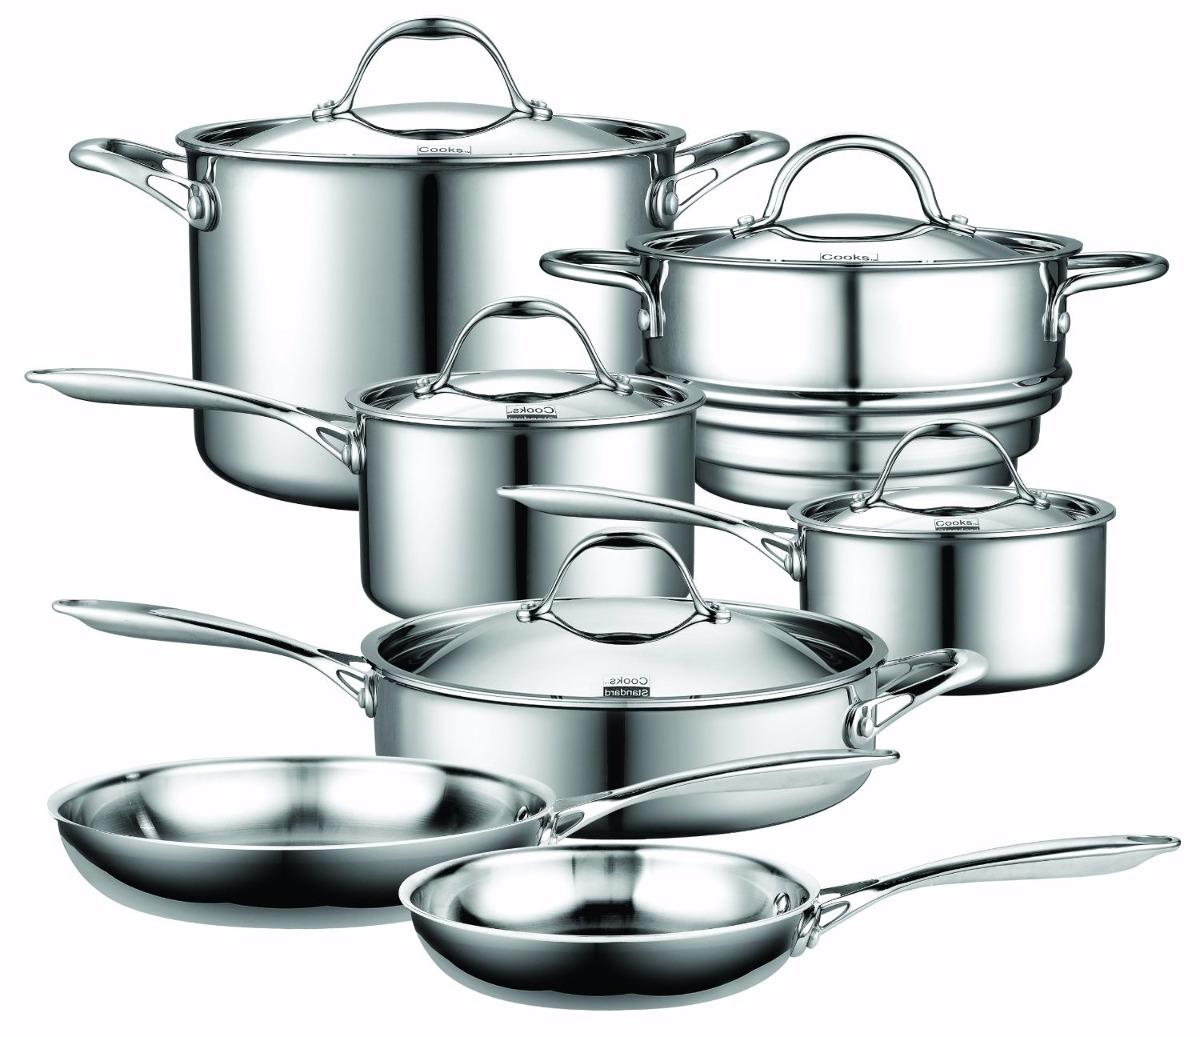 Cooks Standard Utensilios De Cocina De Acero Inoxidable 12 ...